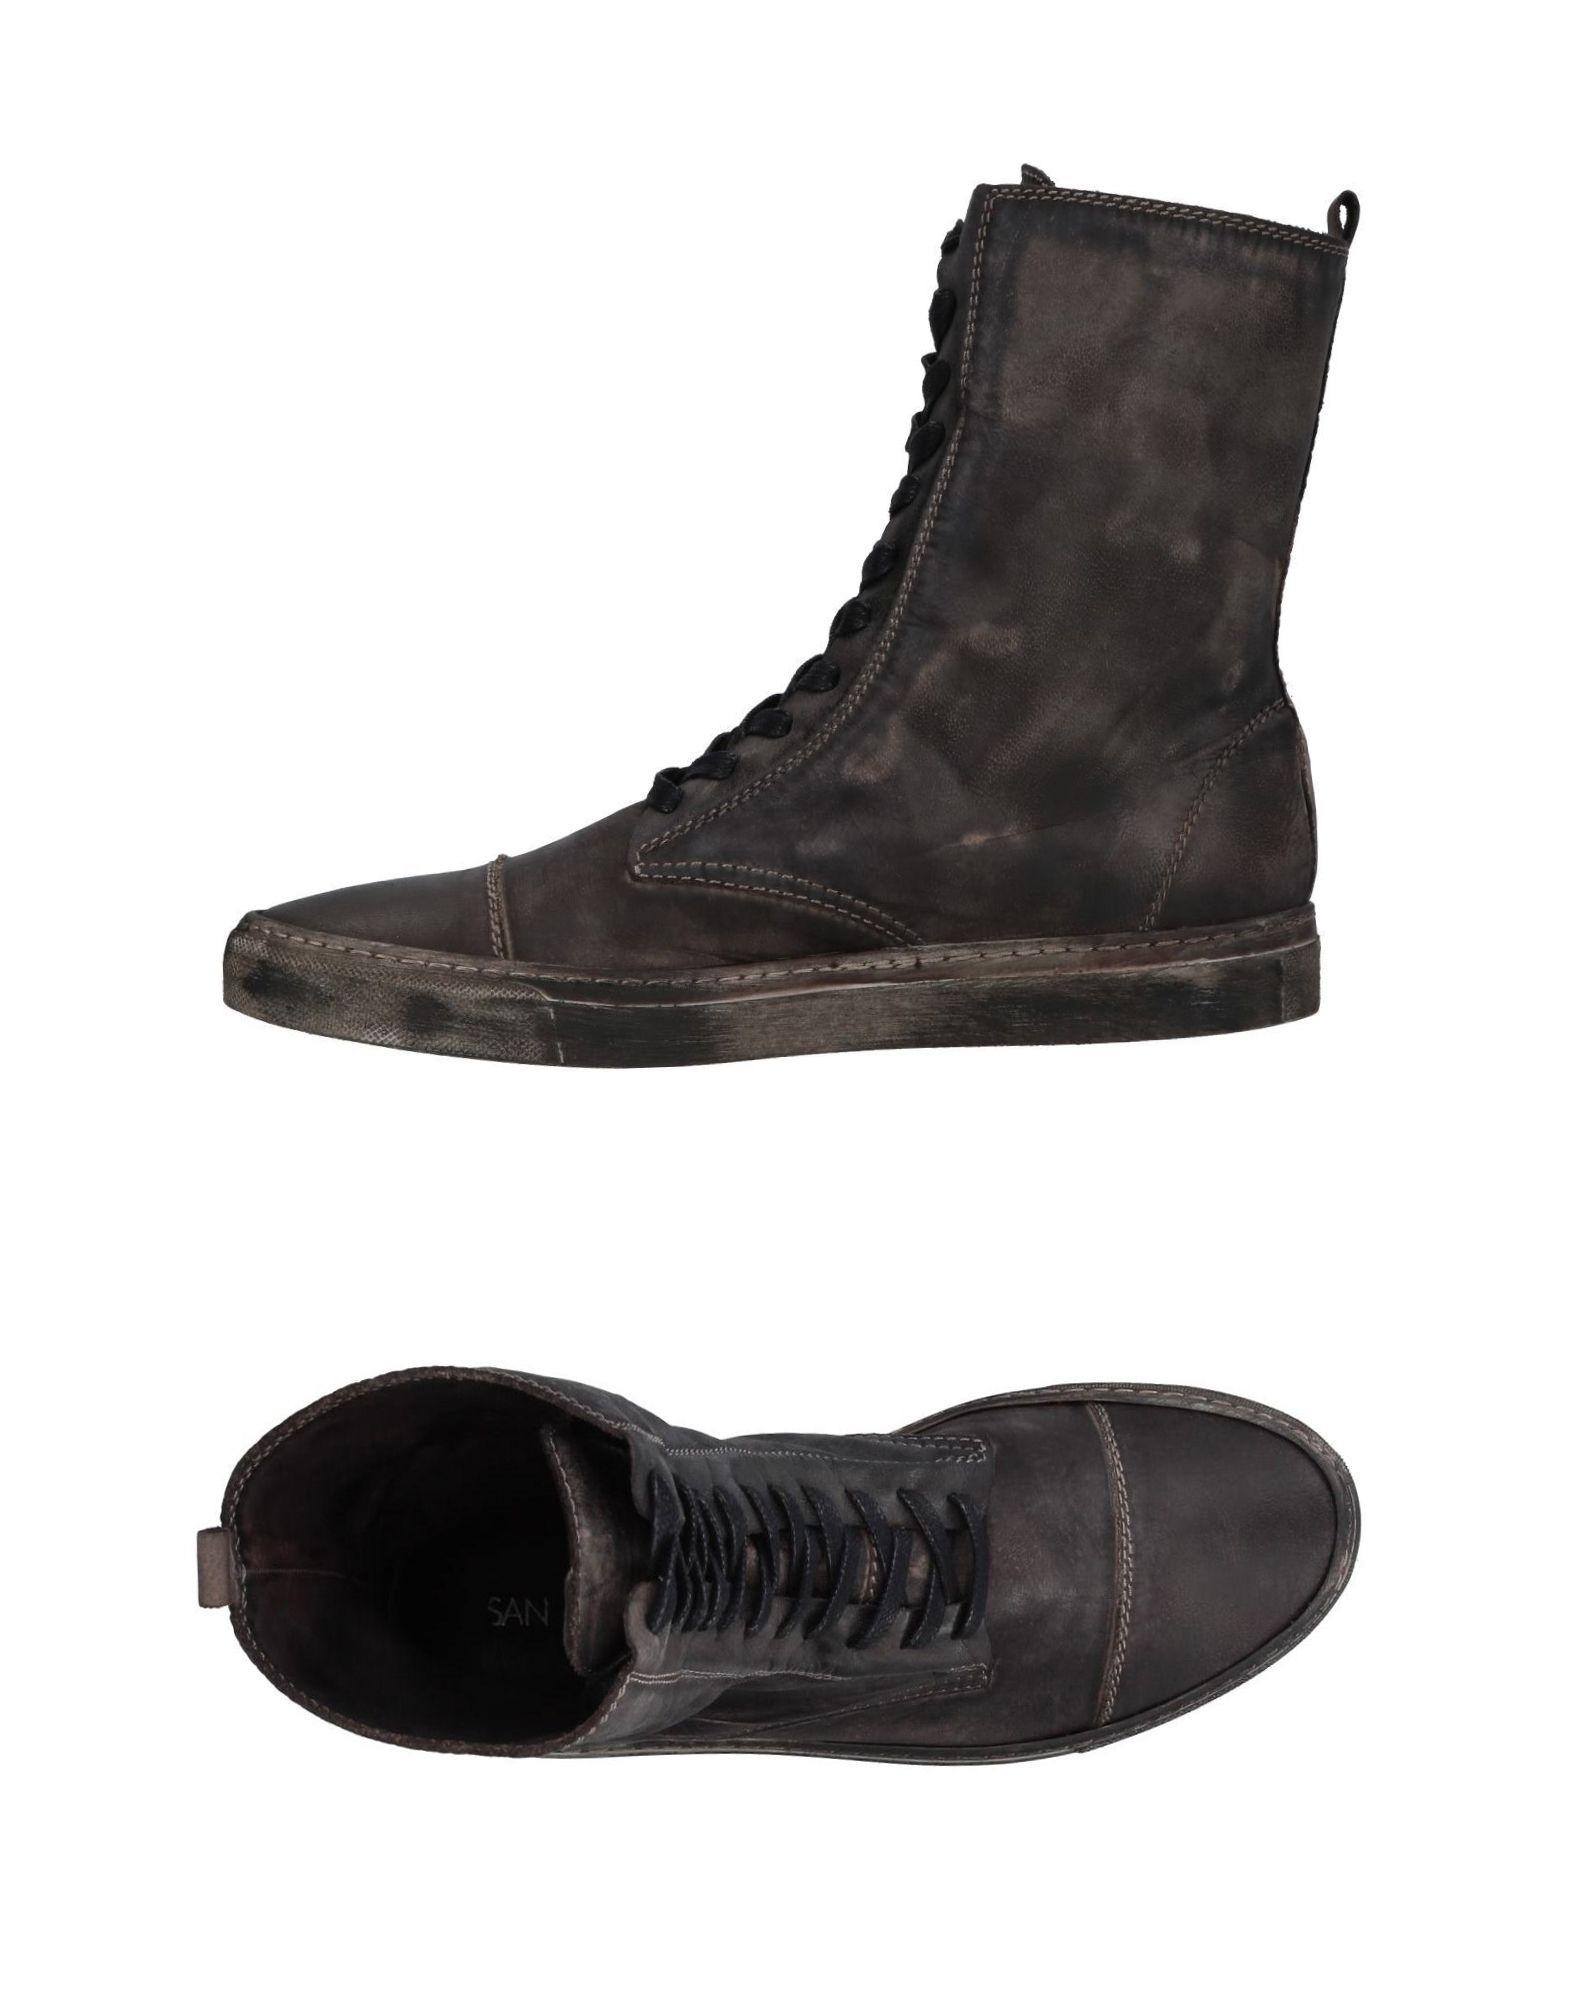 San Crispino Sneakers Damen  11373480BH Gute Qualität beliebte Schuhe